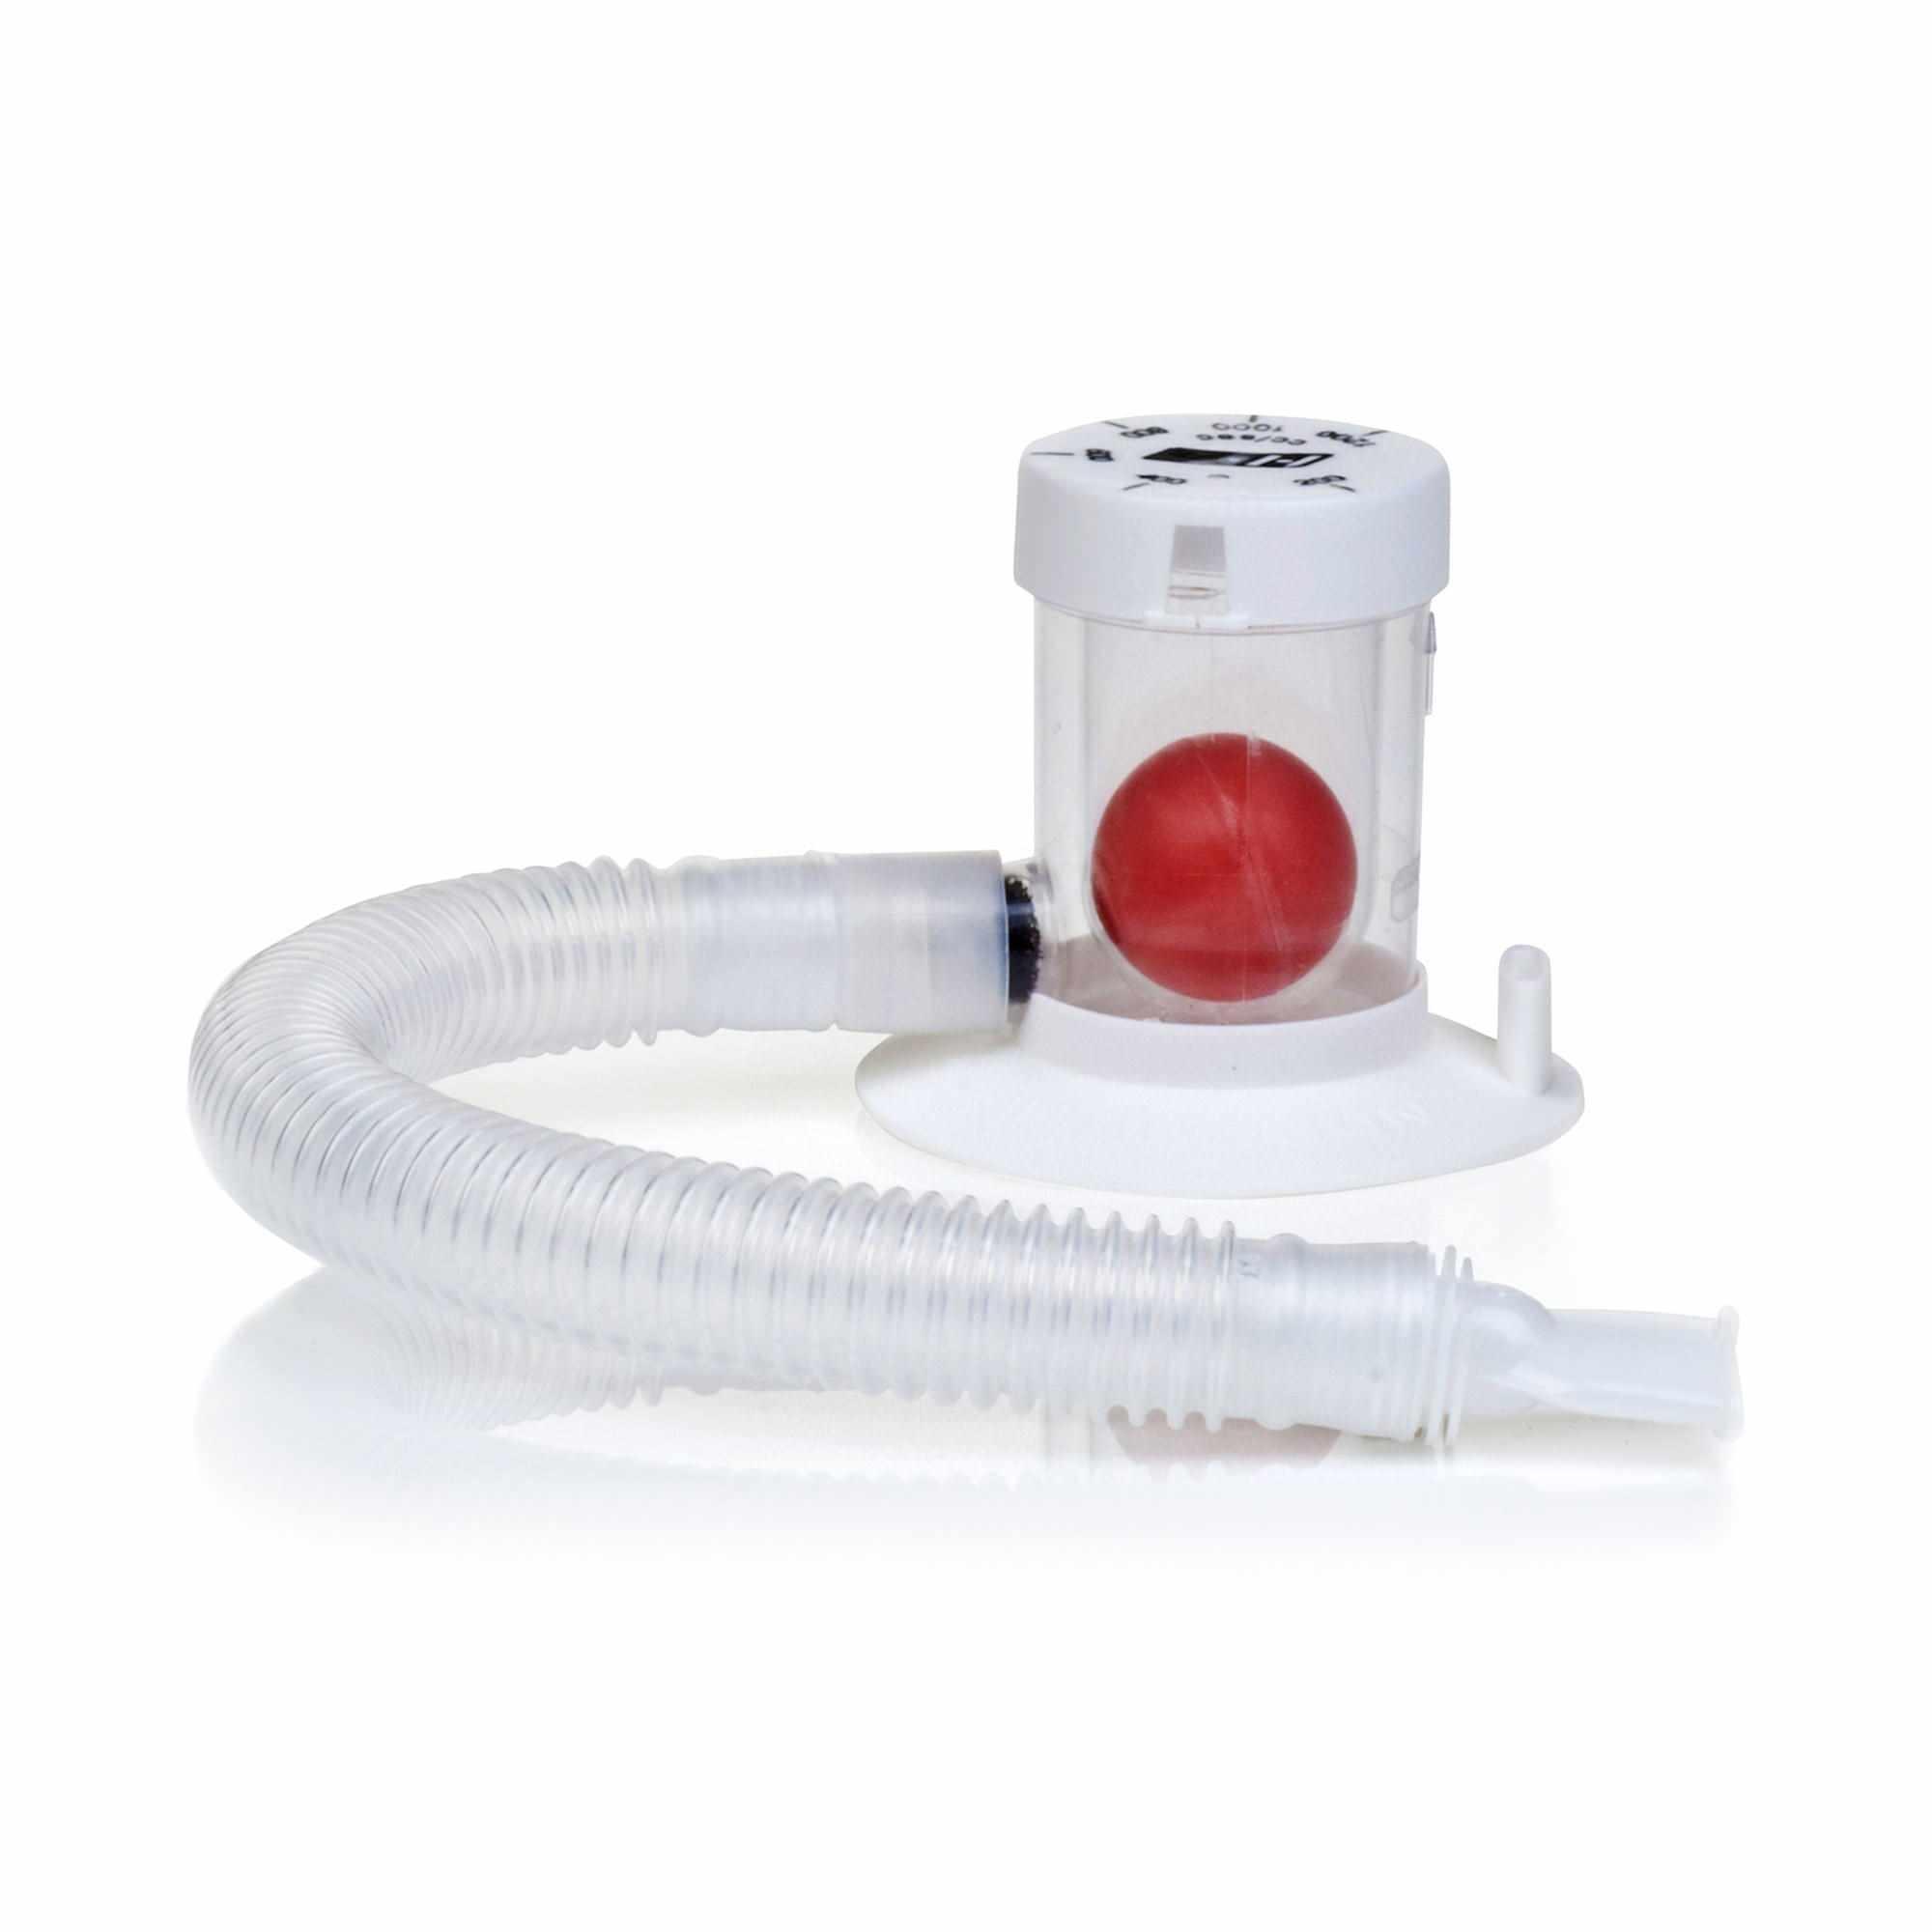 Teleflex Incentive Spirometer